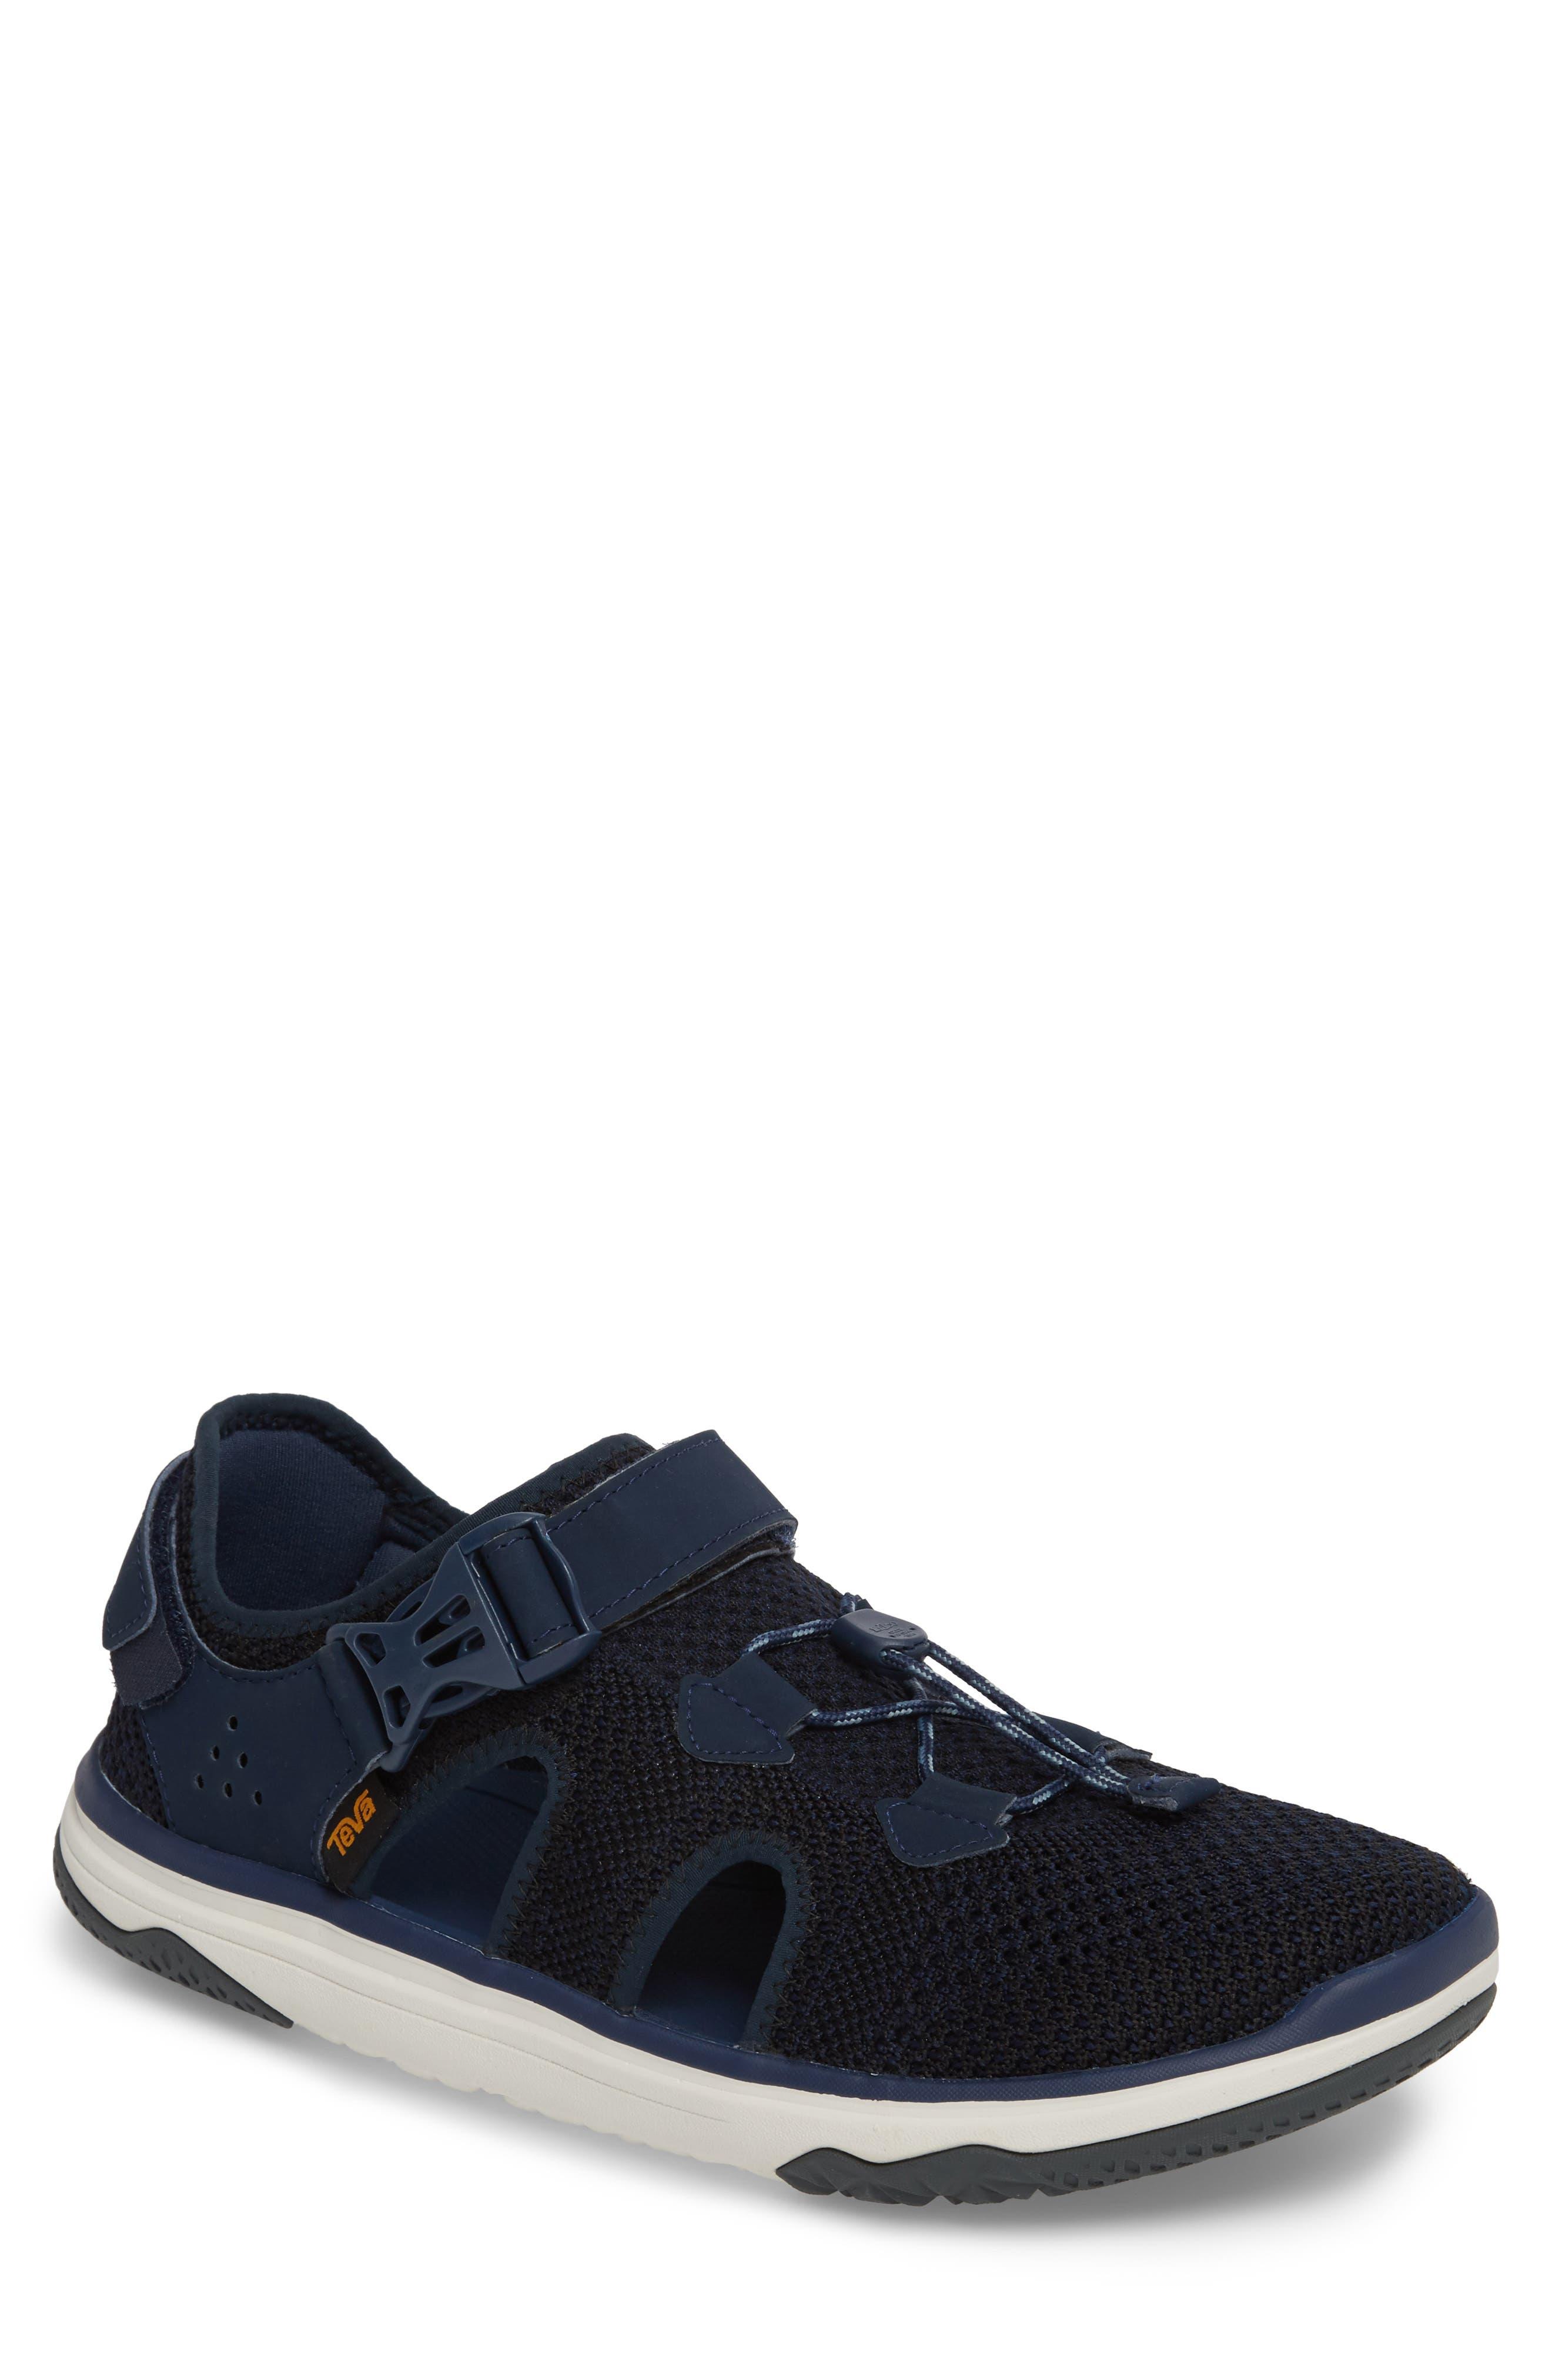 Terra Float Travel Sneaker,                             Main thumbnail 1, color,                             Navy Knit